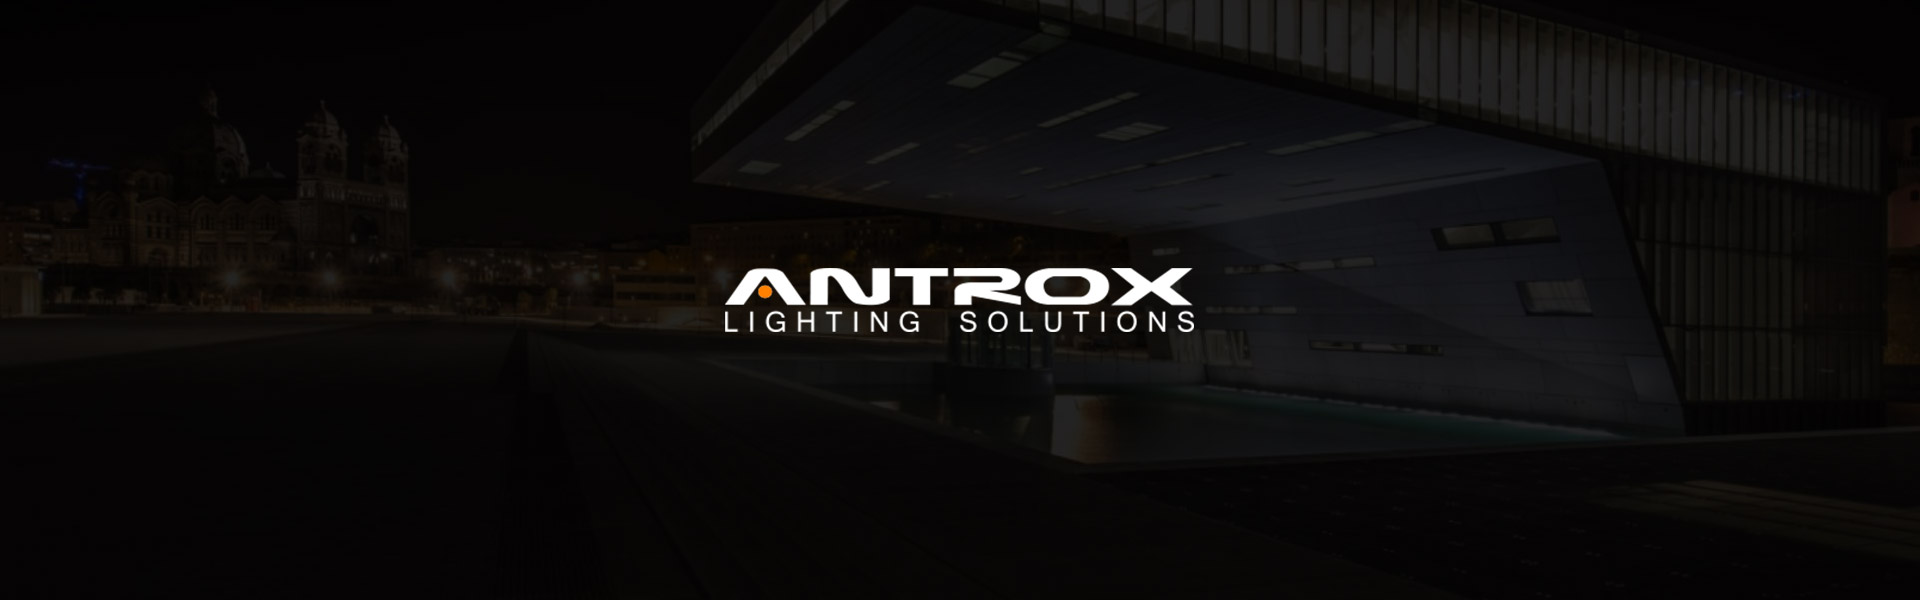 antrox_02